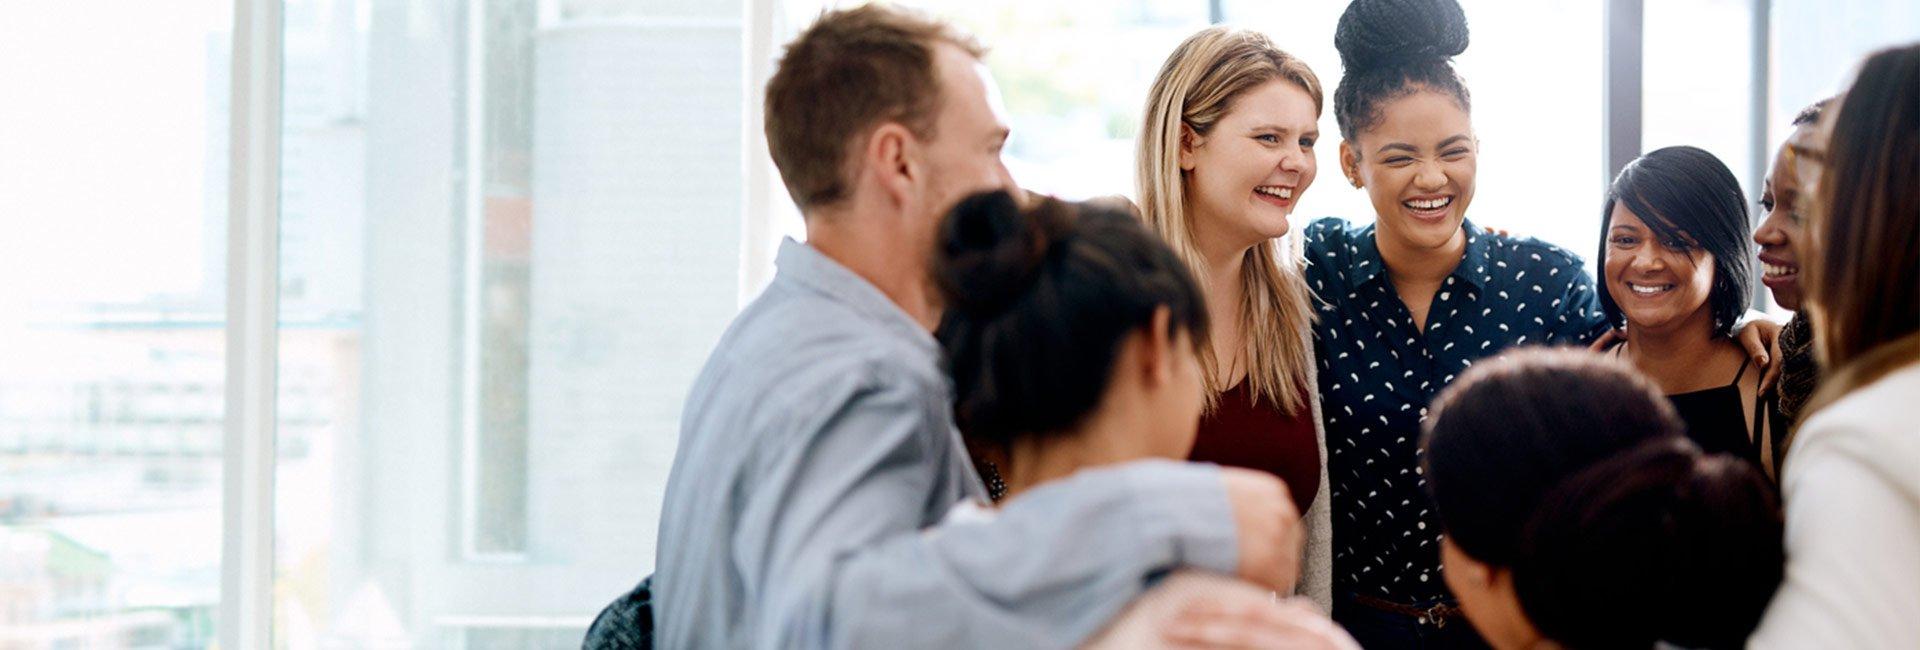 corporate retreat ideas for team building